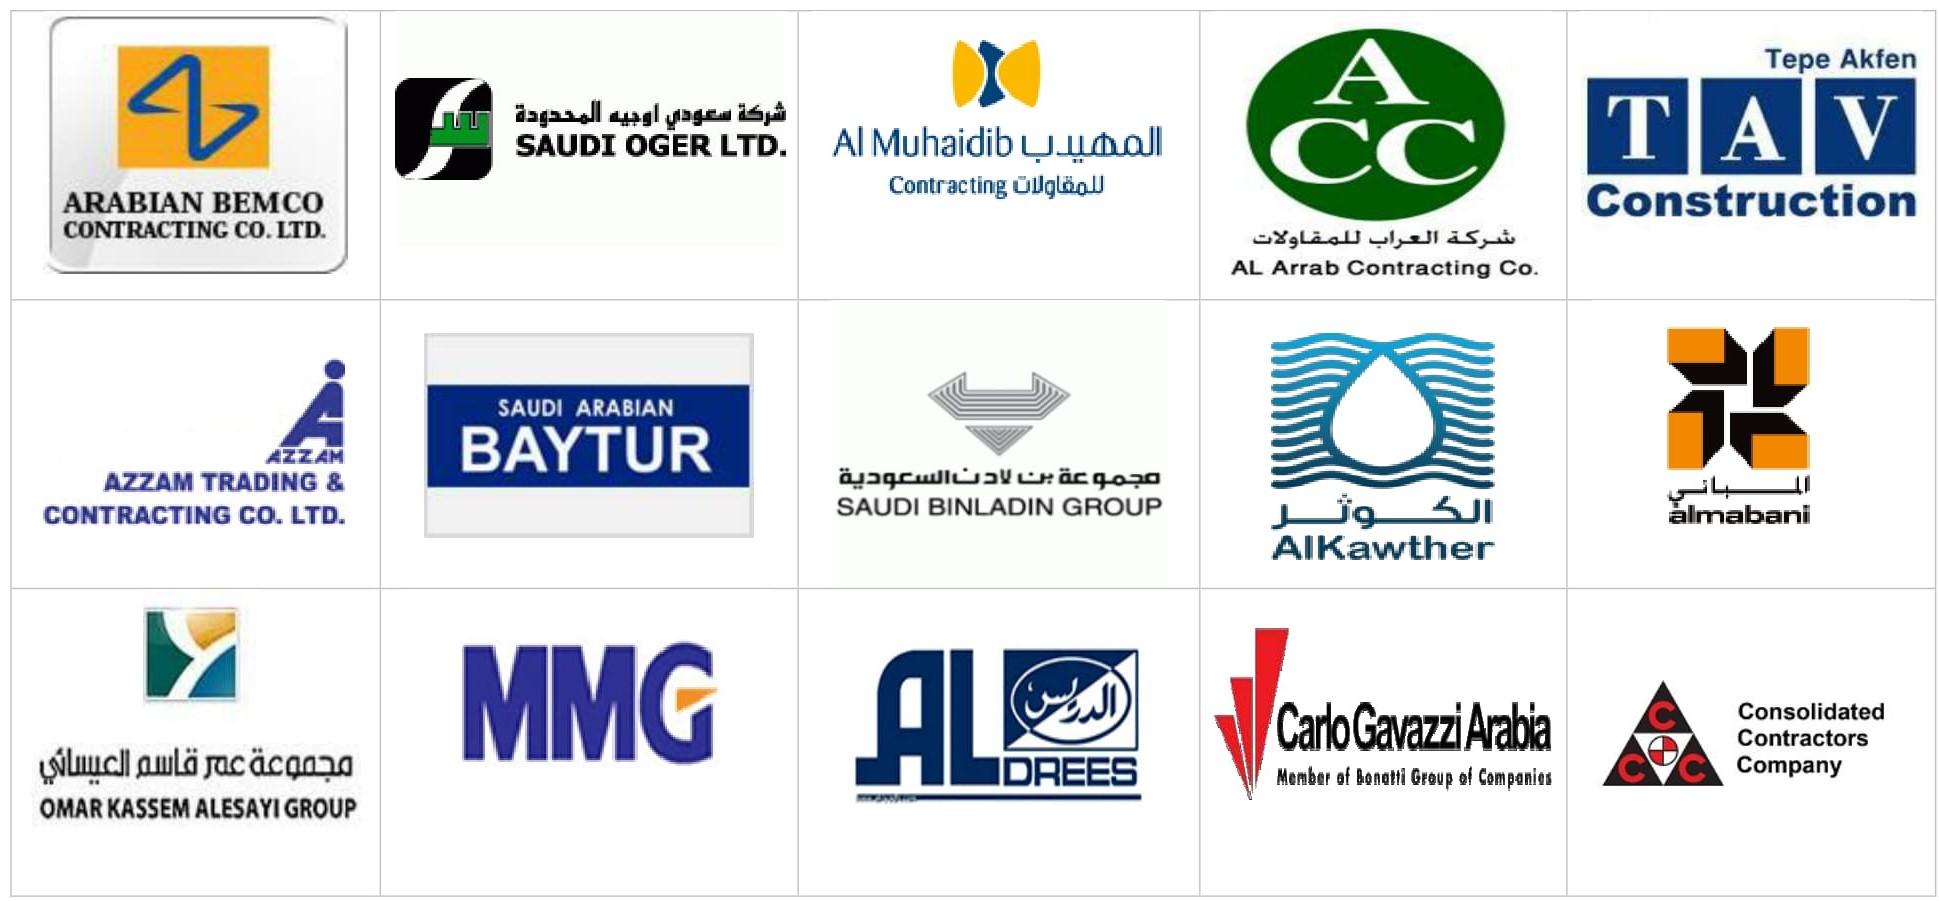 companys-logo-1-1 (1)